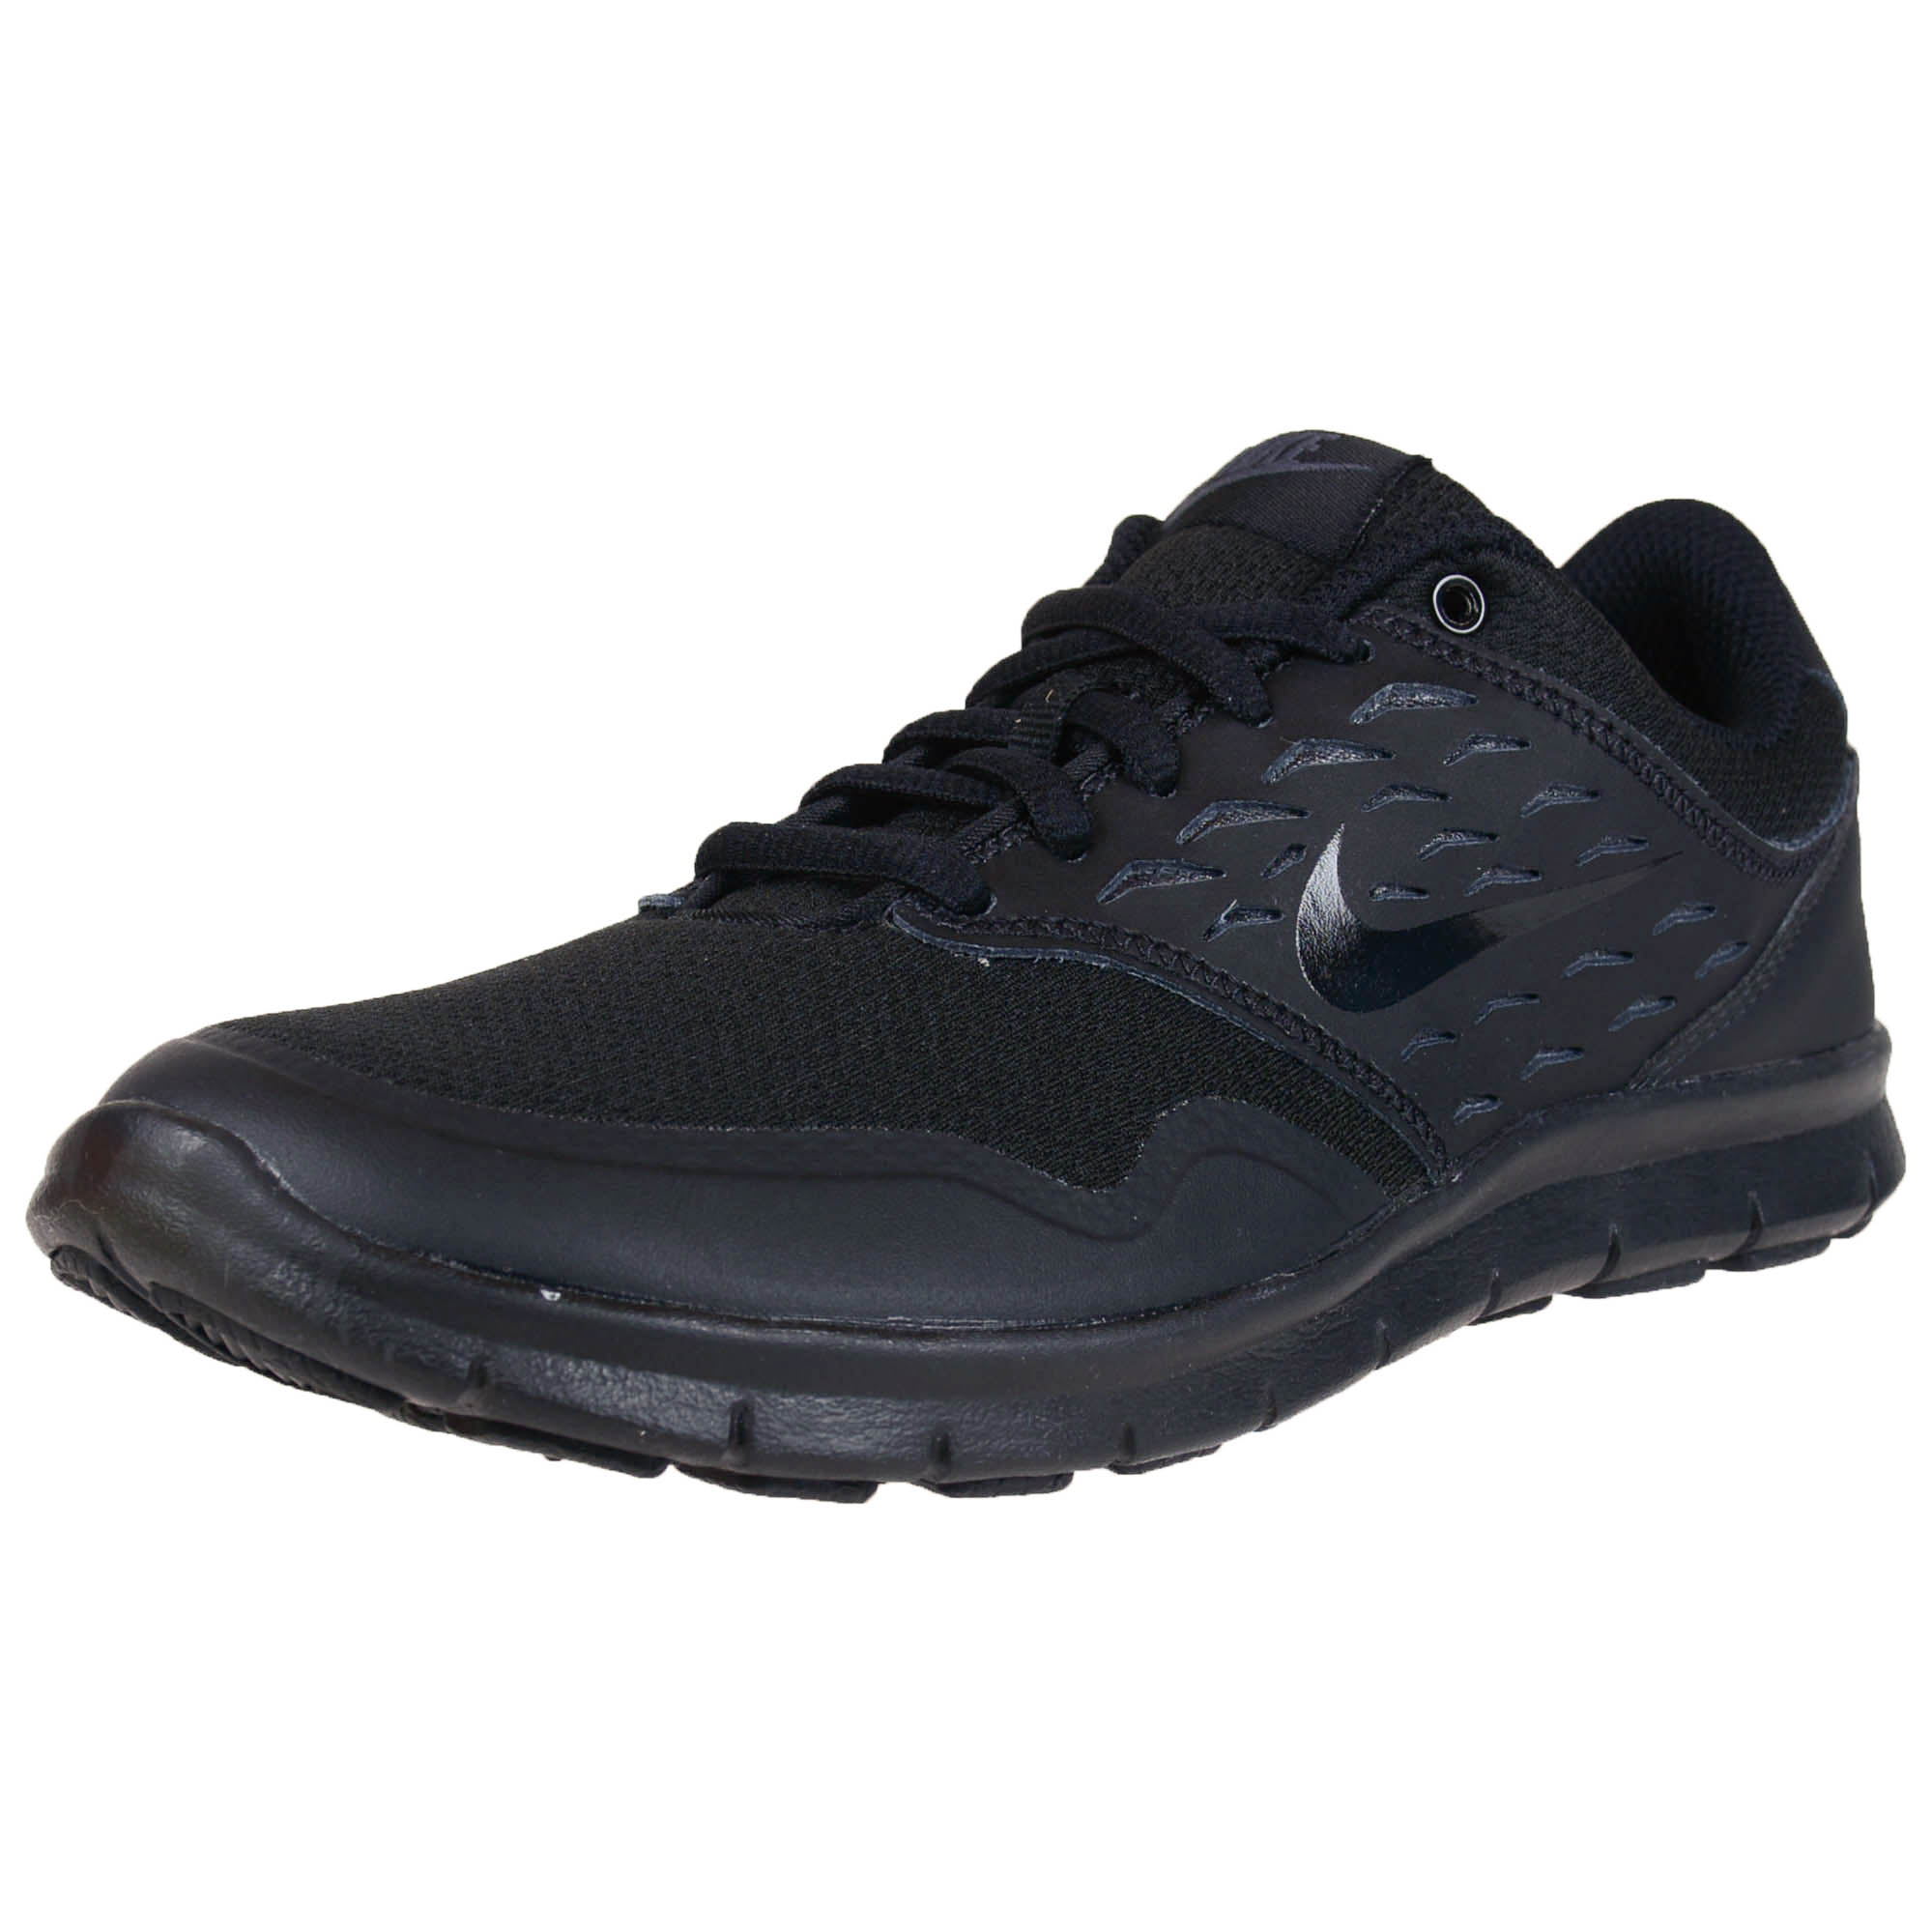 Orive Nm Running Training Shoes